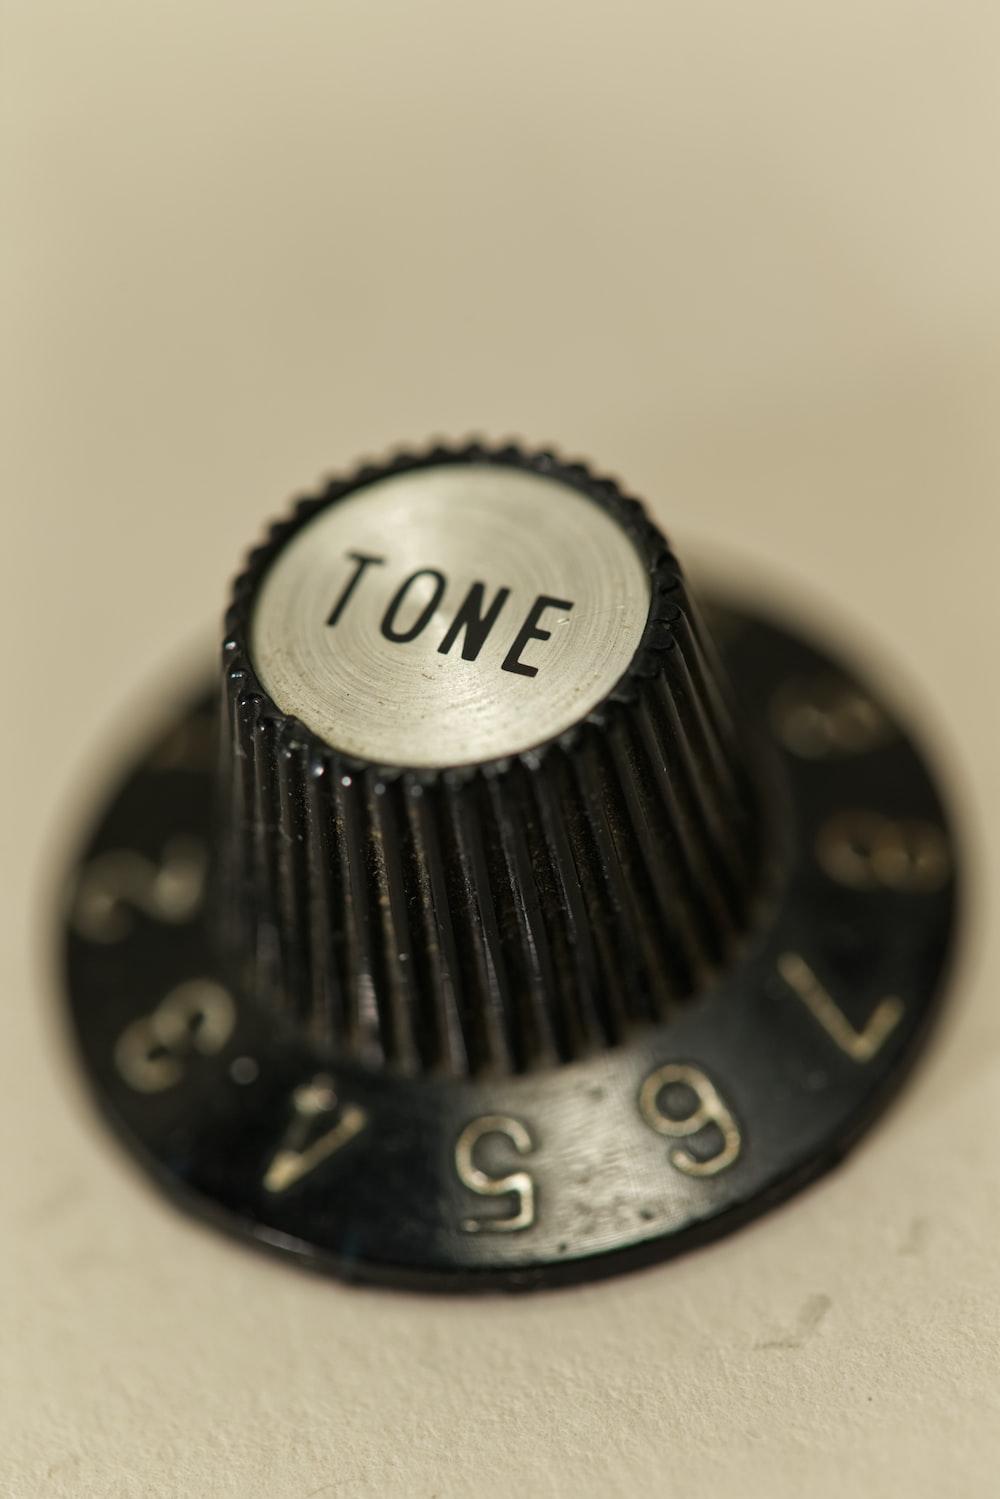 Tone control knob on white surface